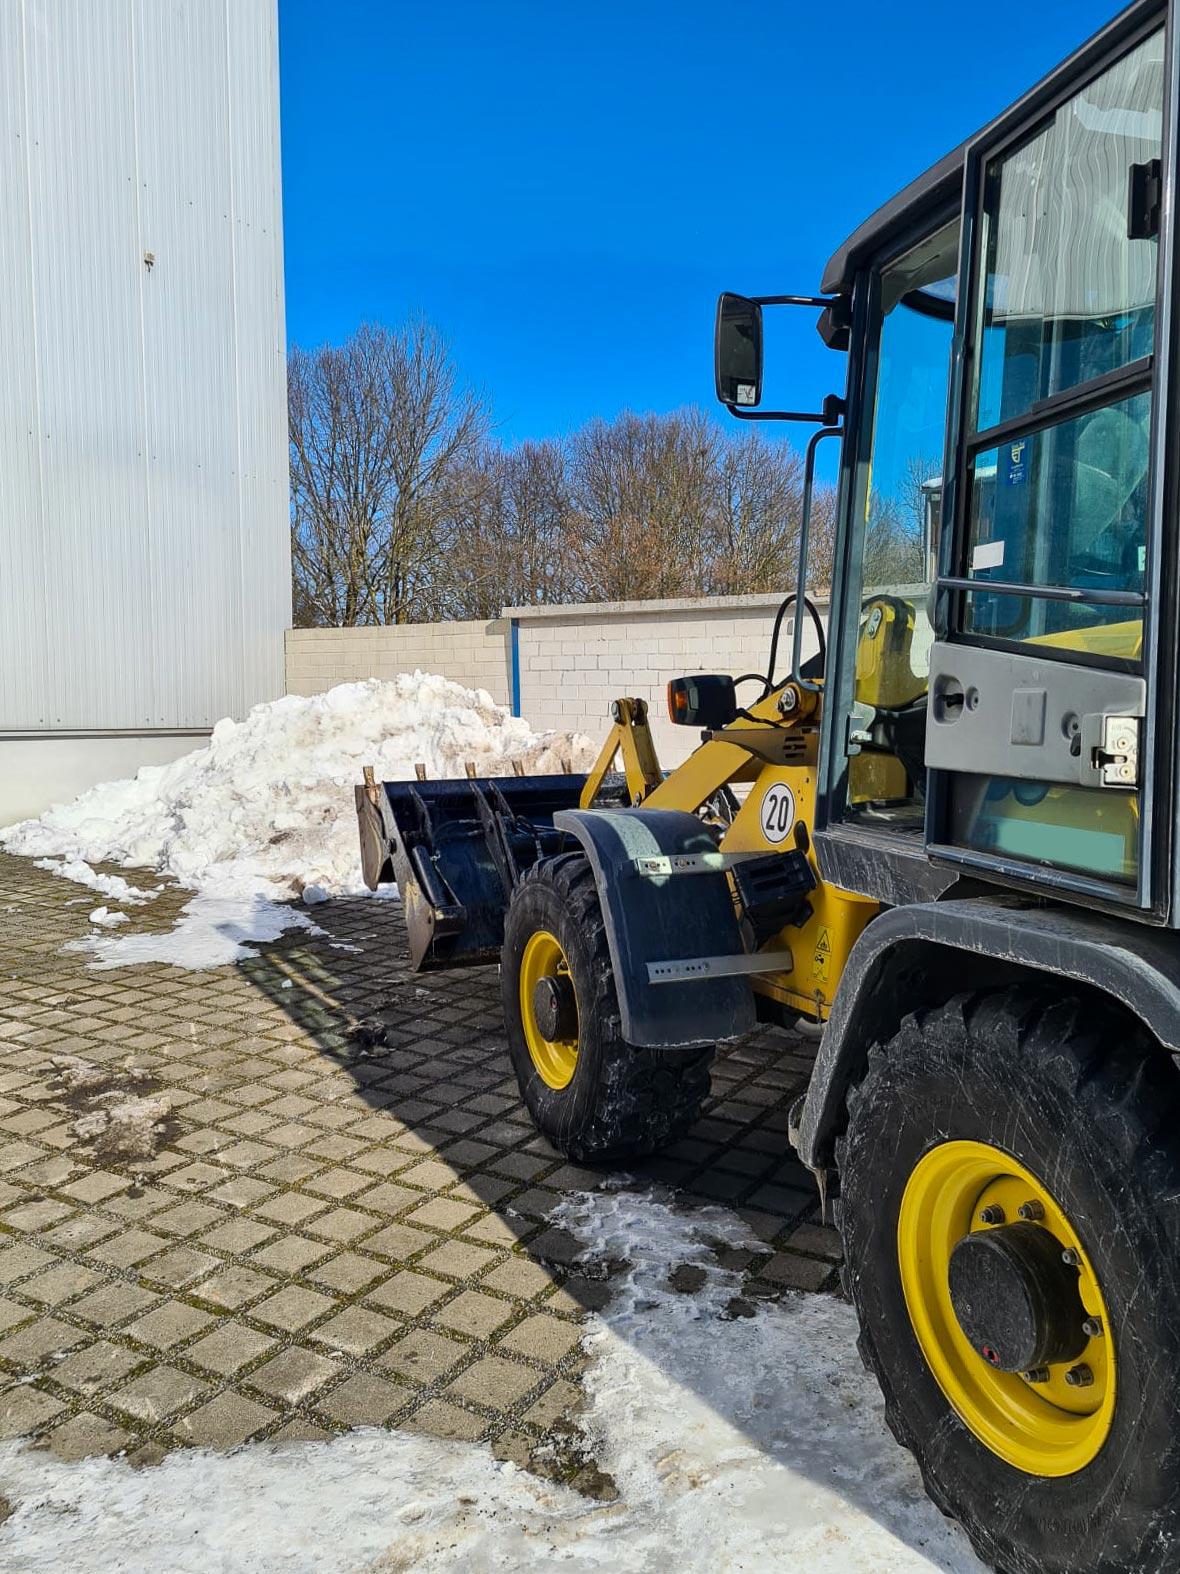 Winterdienst Fuhrpark Manske Hamm 3